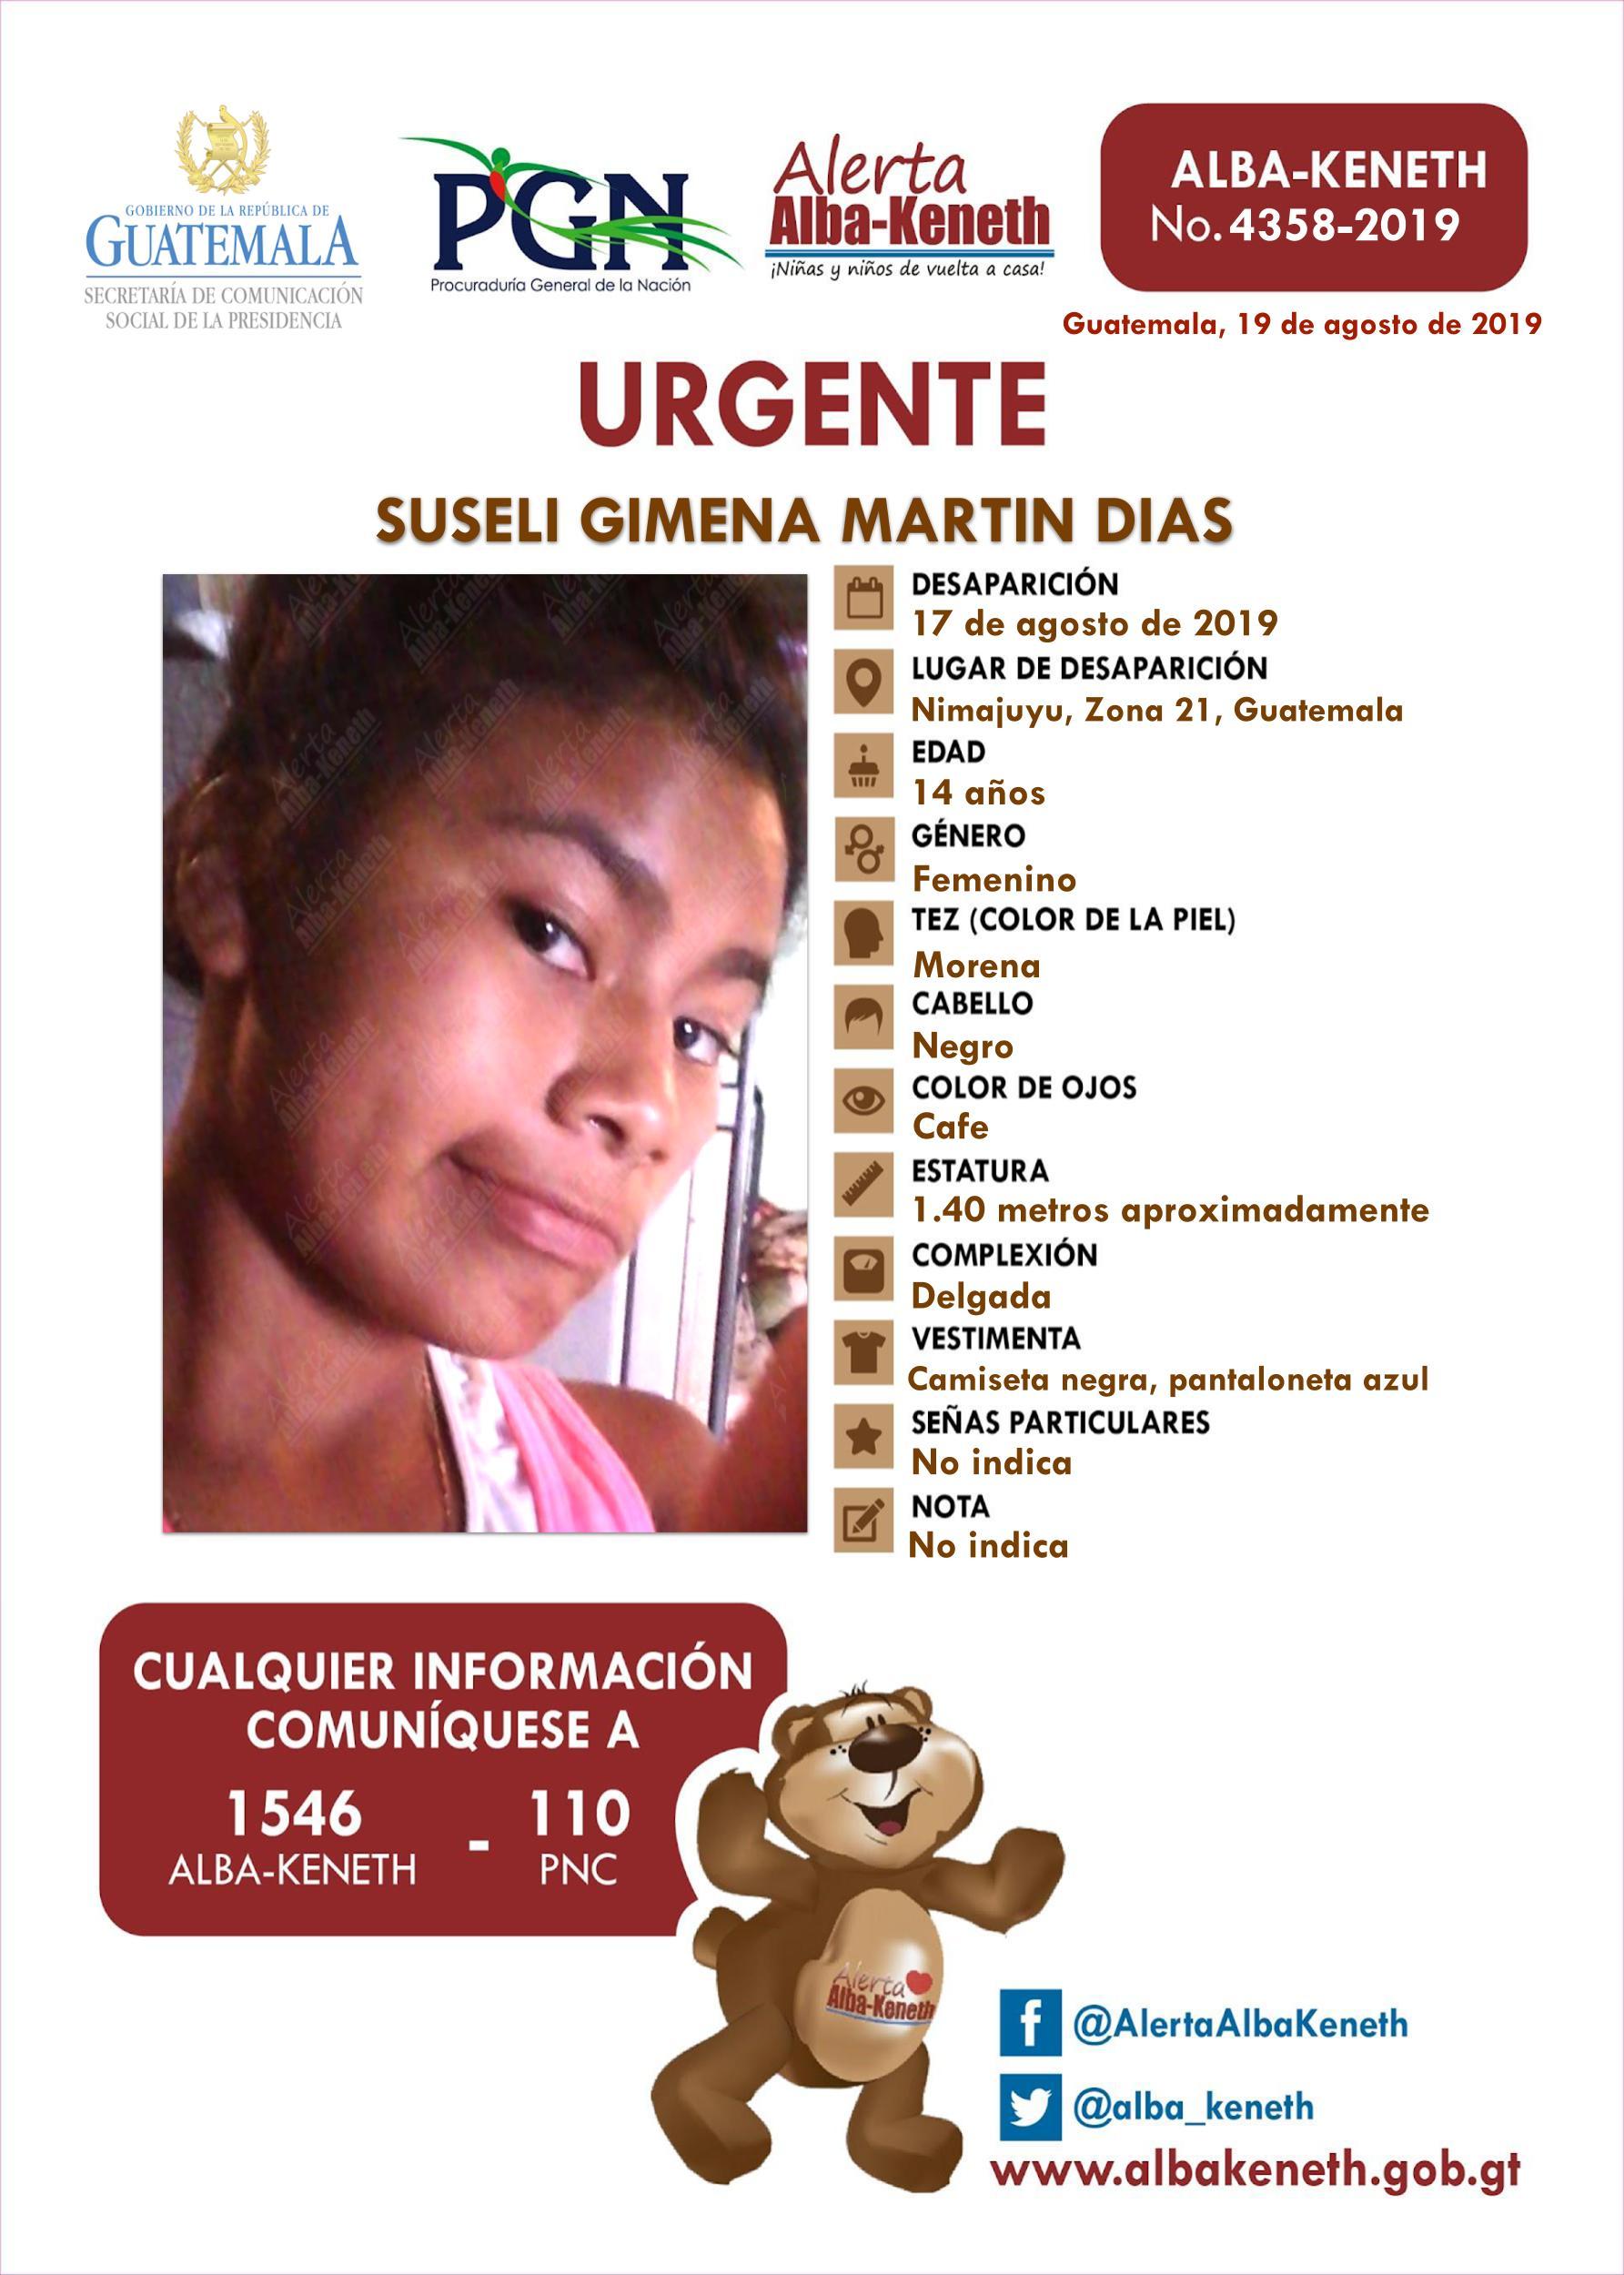 Suceli Gimena Martin Dias